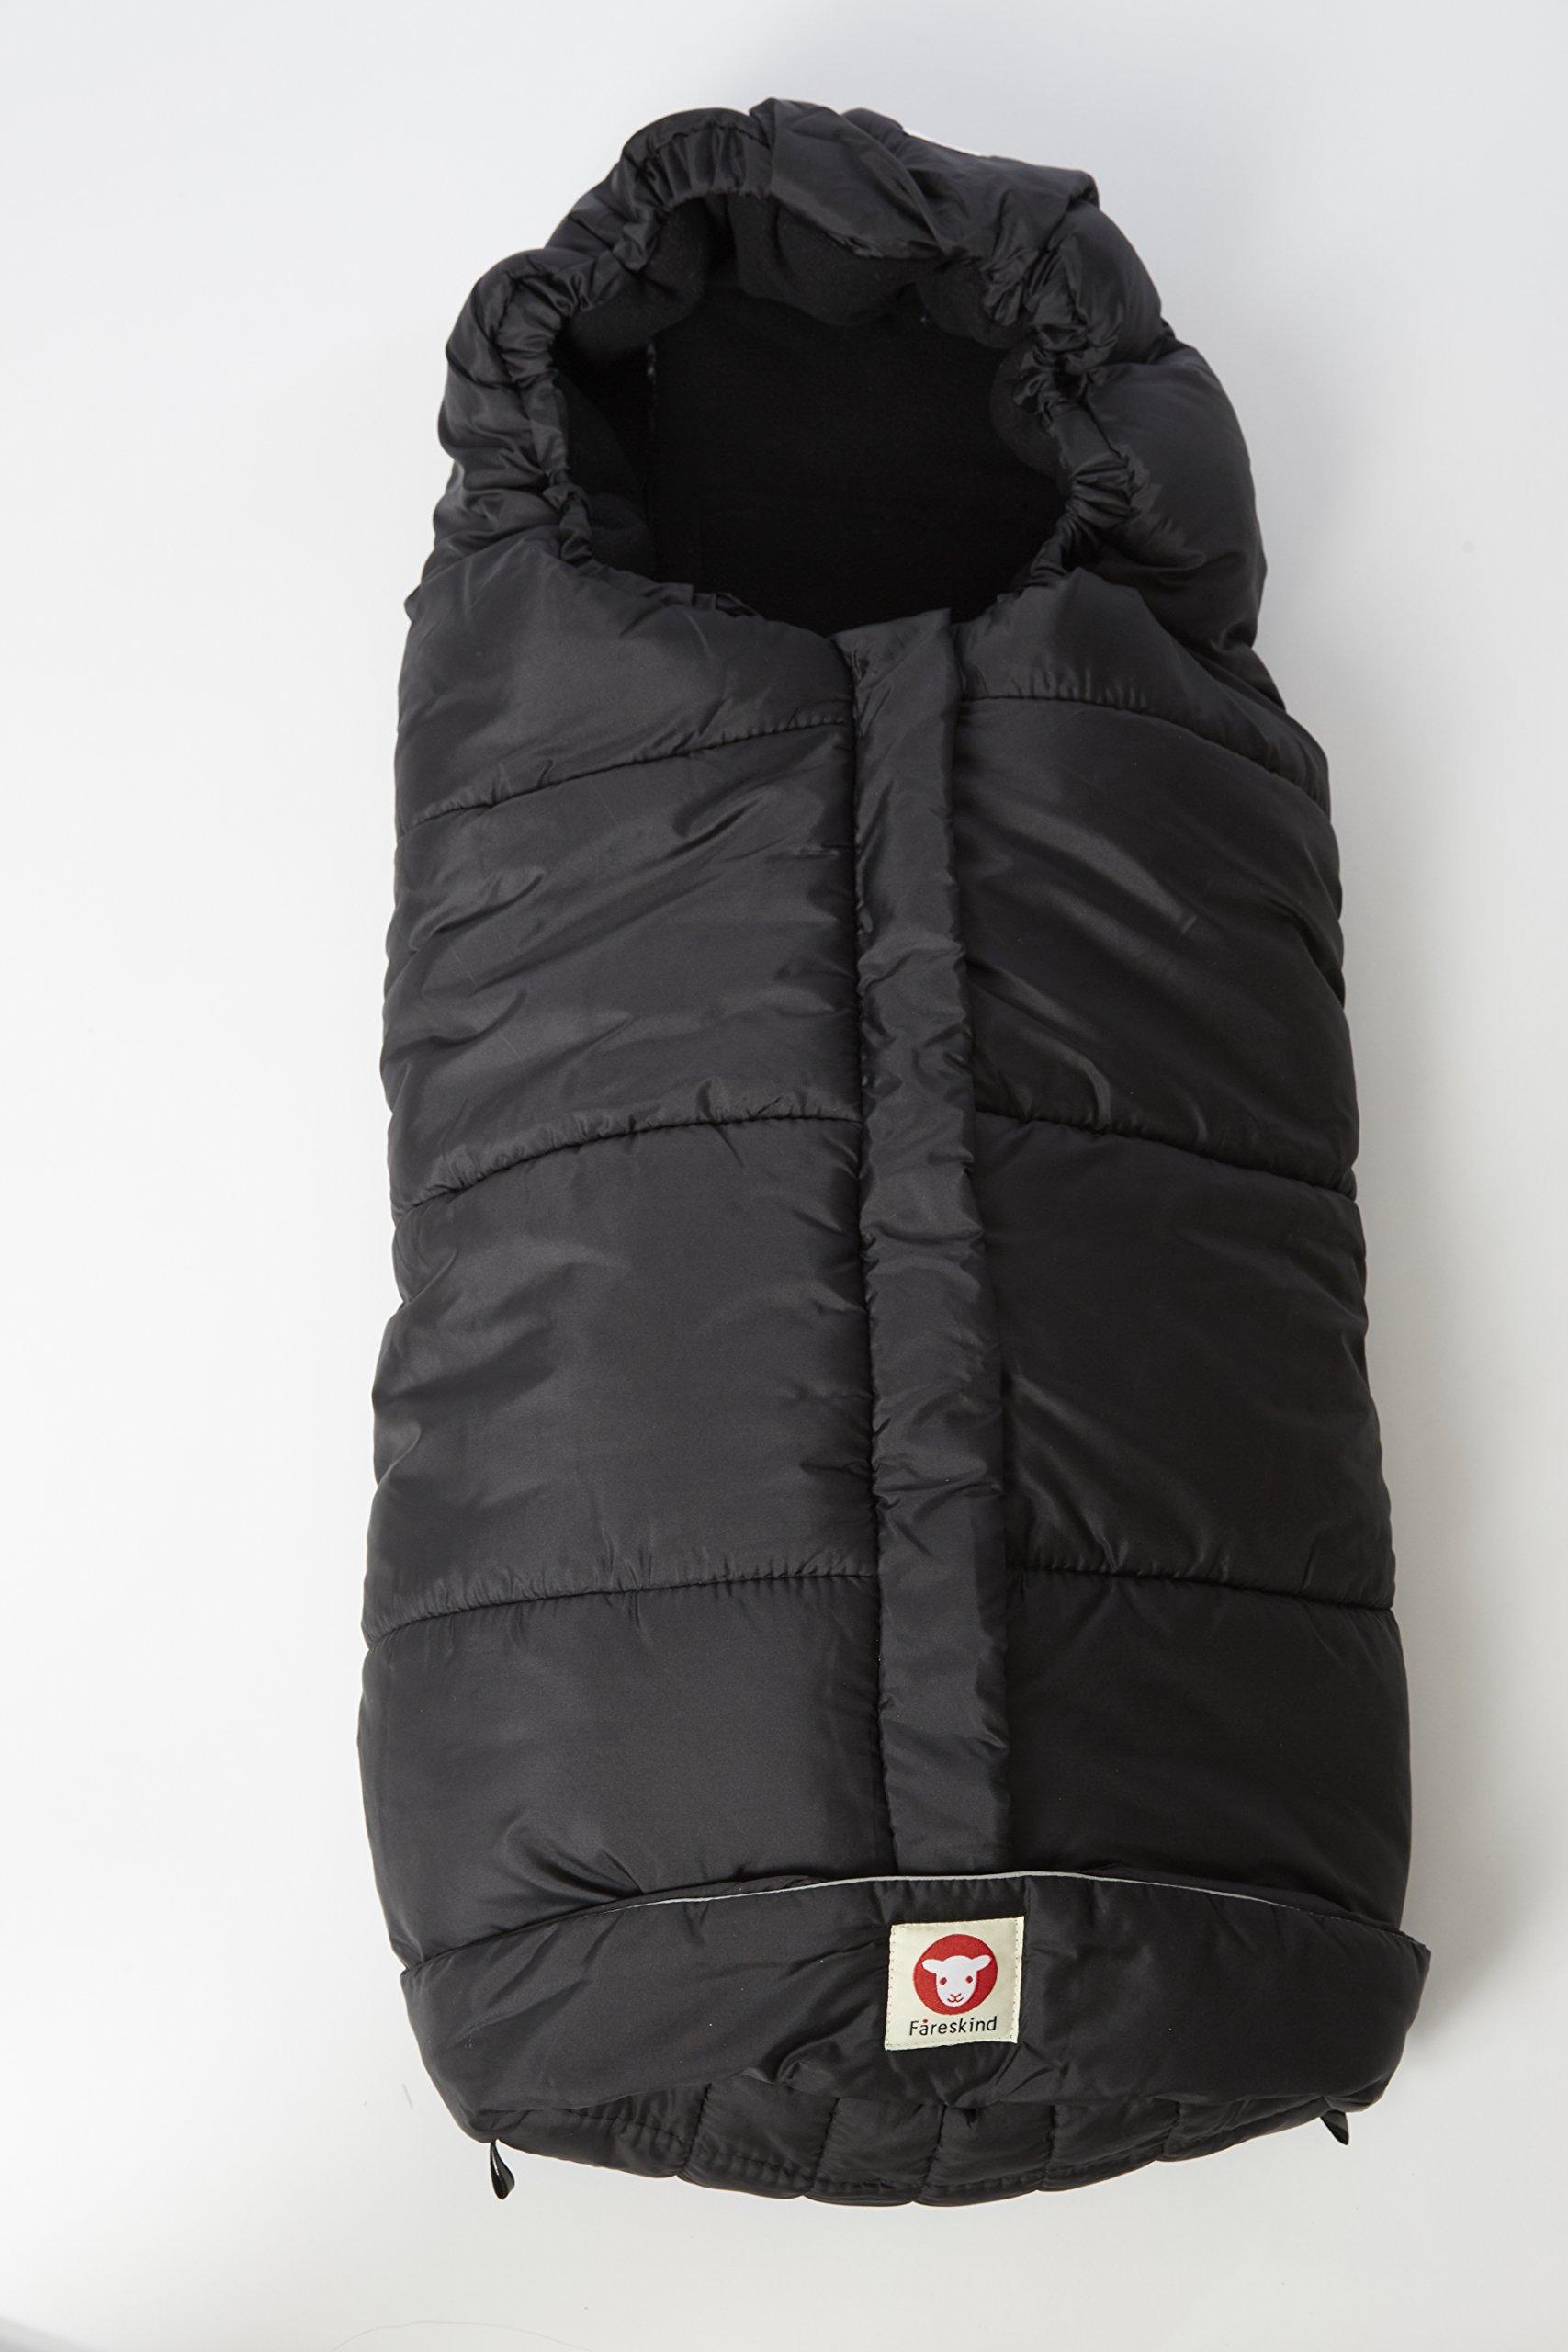 Fareskind Comfy Cruiser Bunting Bag, Black, 0-4 Years